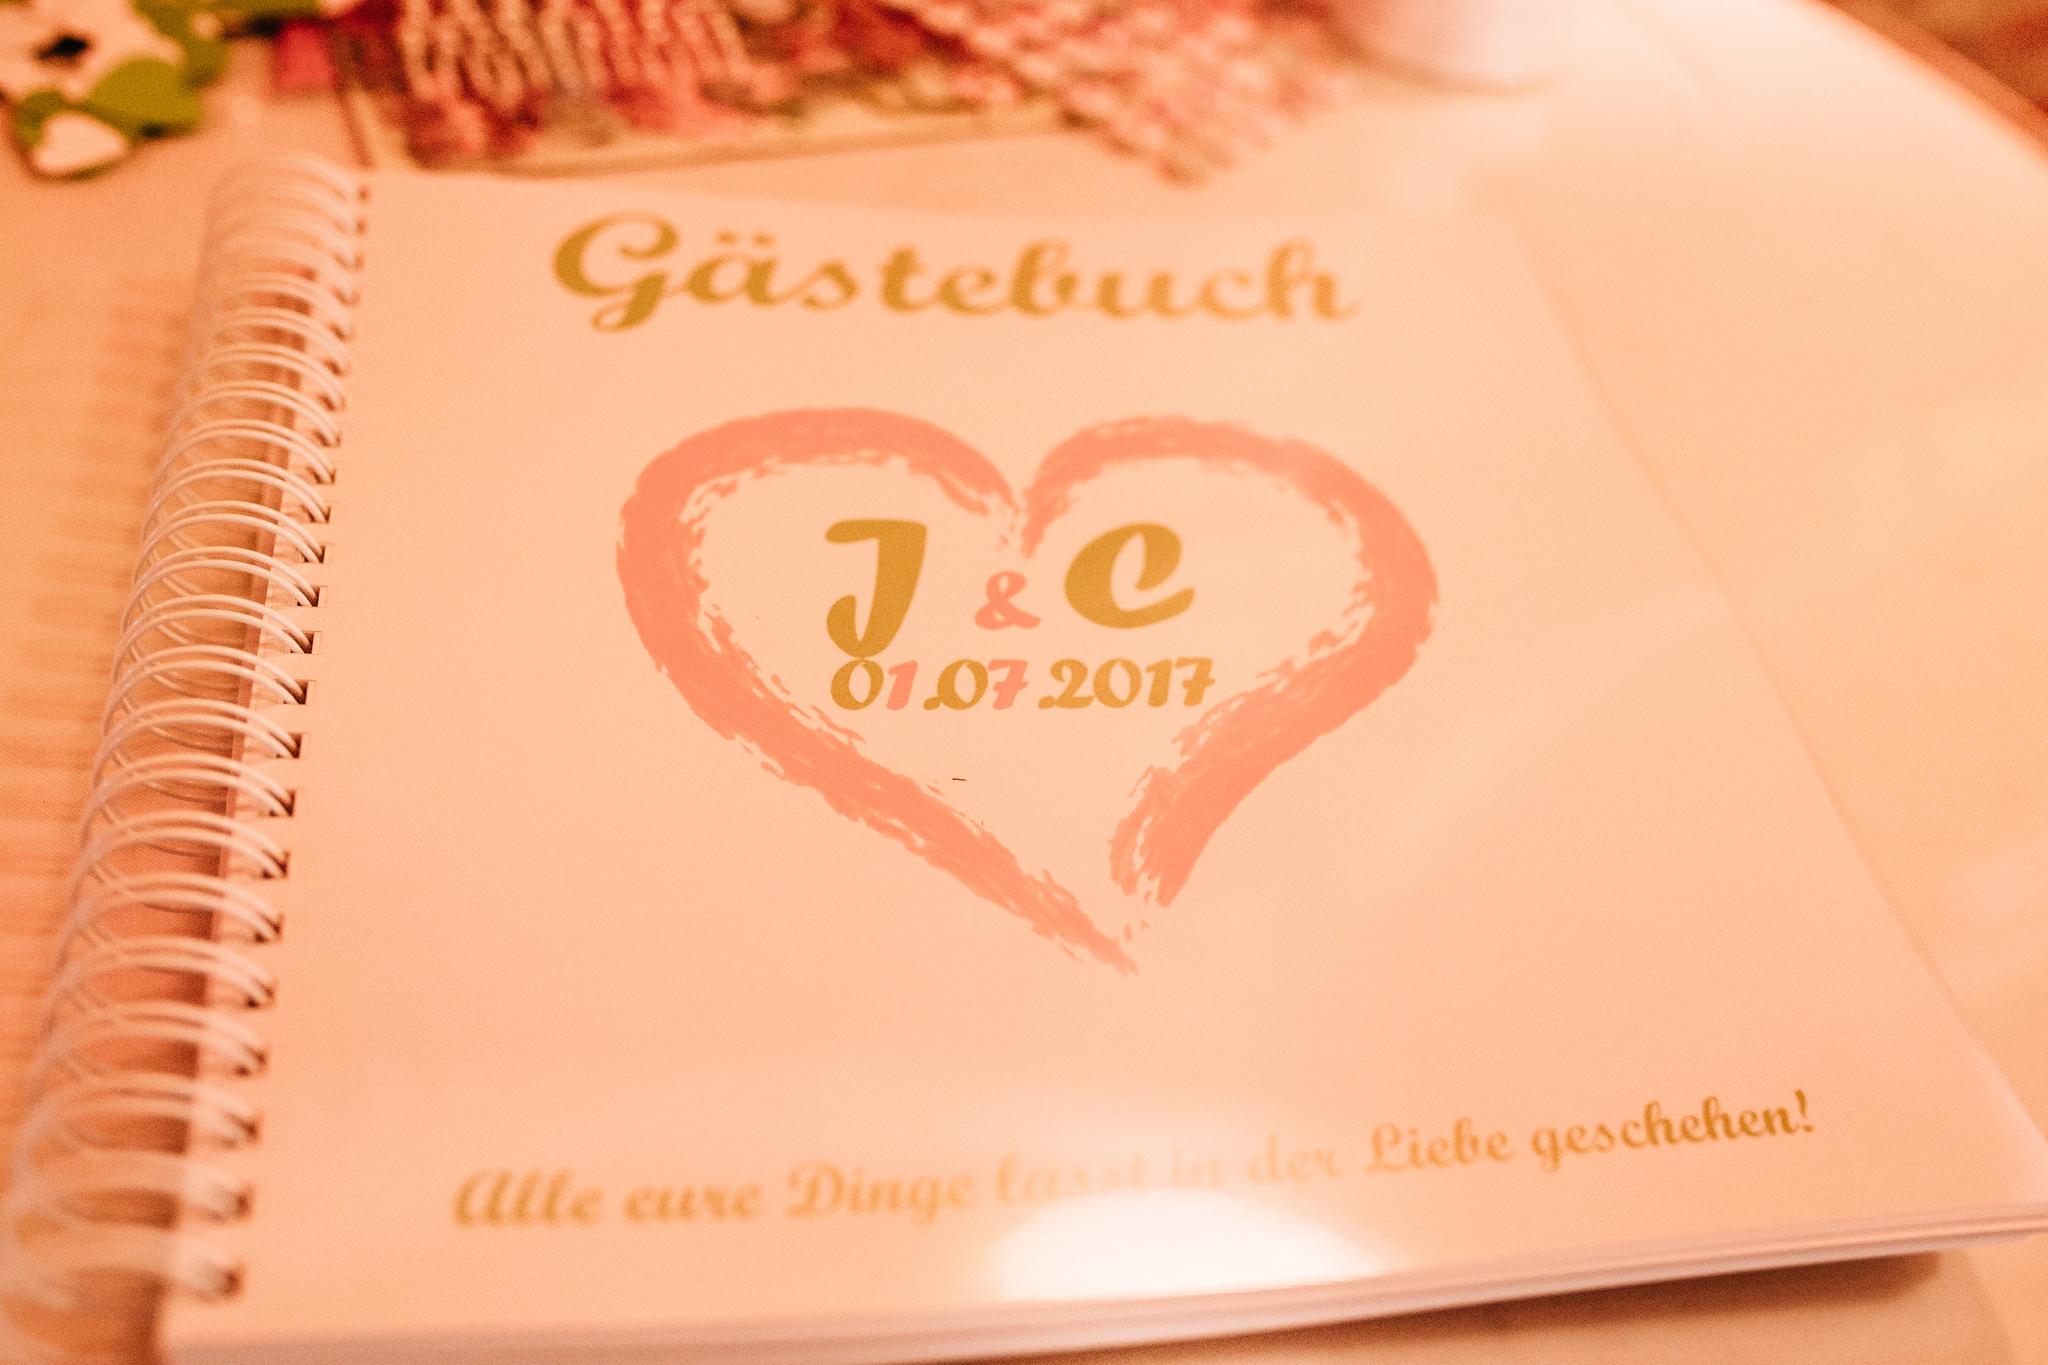 Claudia Krawinkel Fotografie Hochzeitsfotograf Essen Düsseldorf Dormagen Kloster Knechtsteden Hochzeitsreportage Hochzeit Knechtsteden23